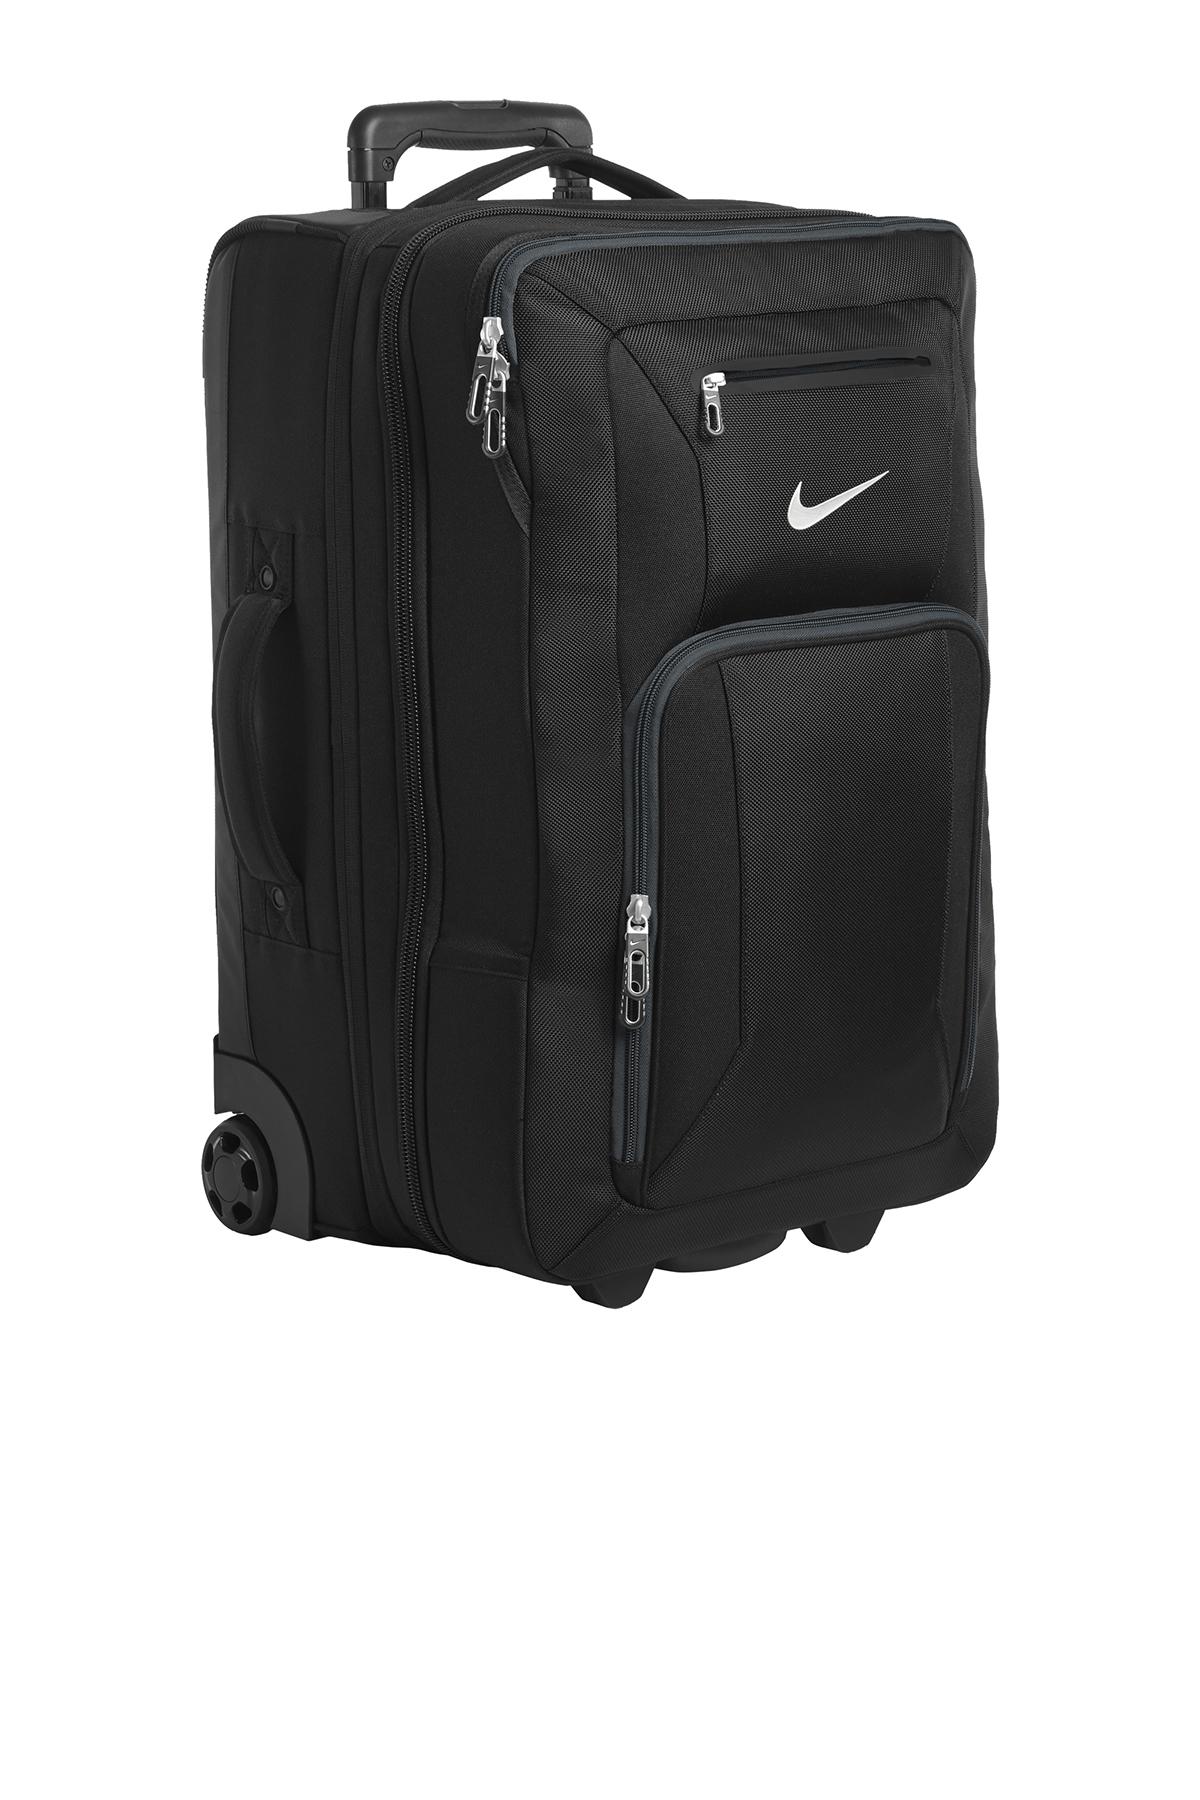 Nike Elite Roller   Rolling Bags   Bags   SanMar e71f834c7e